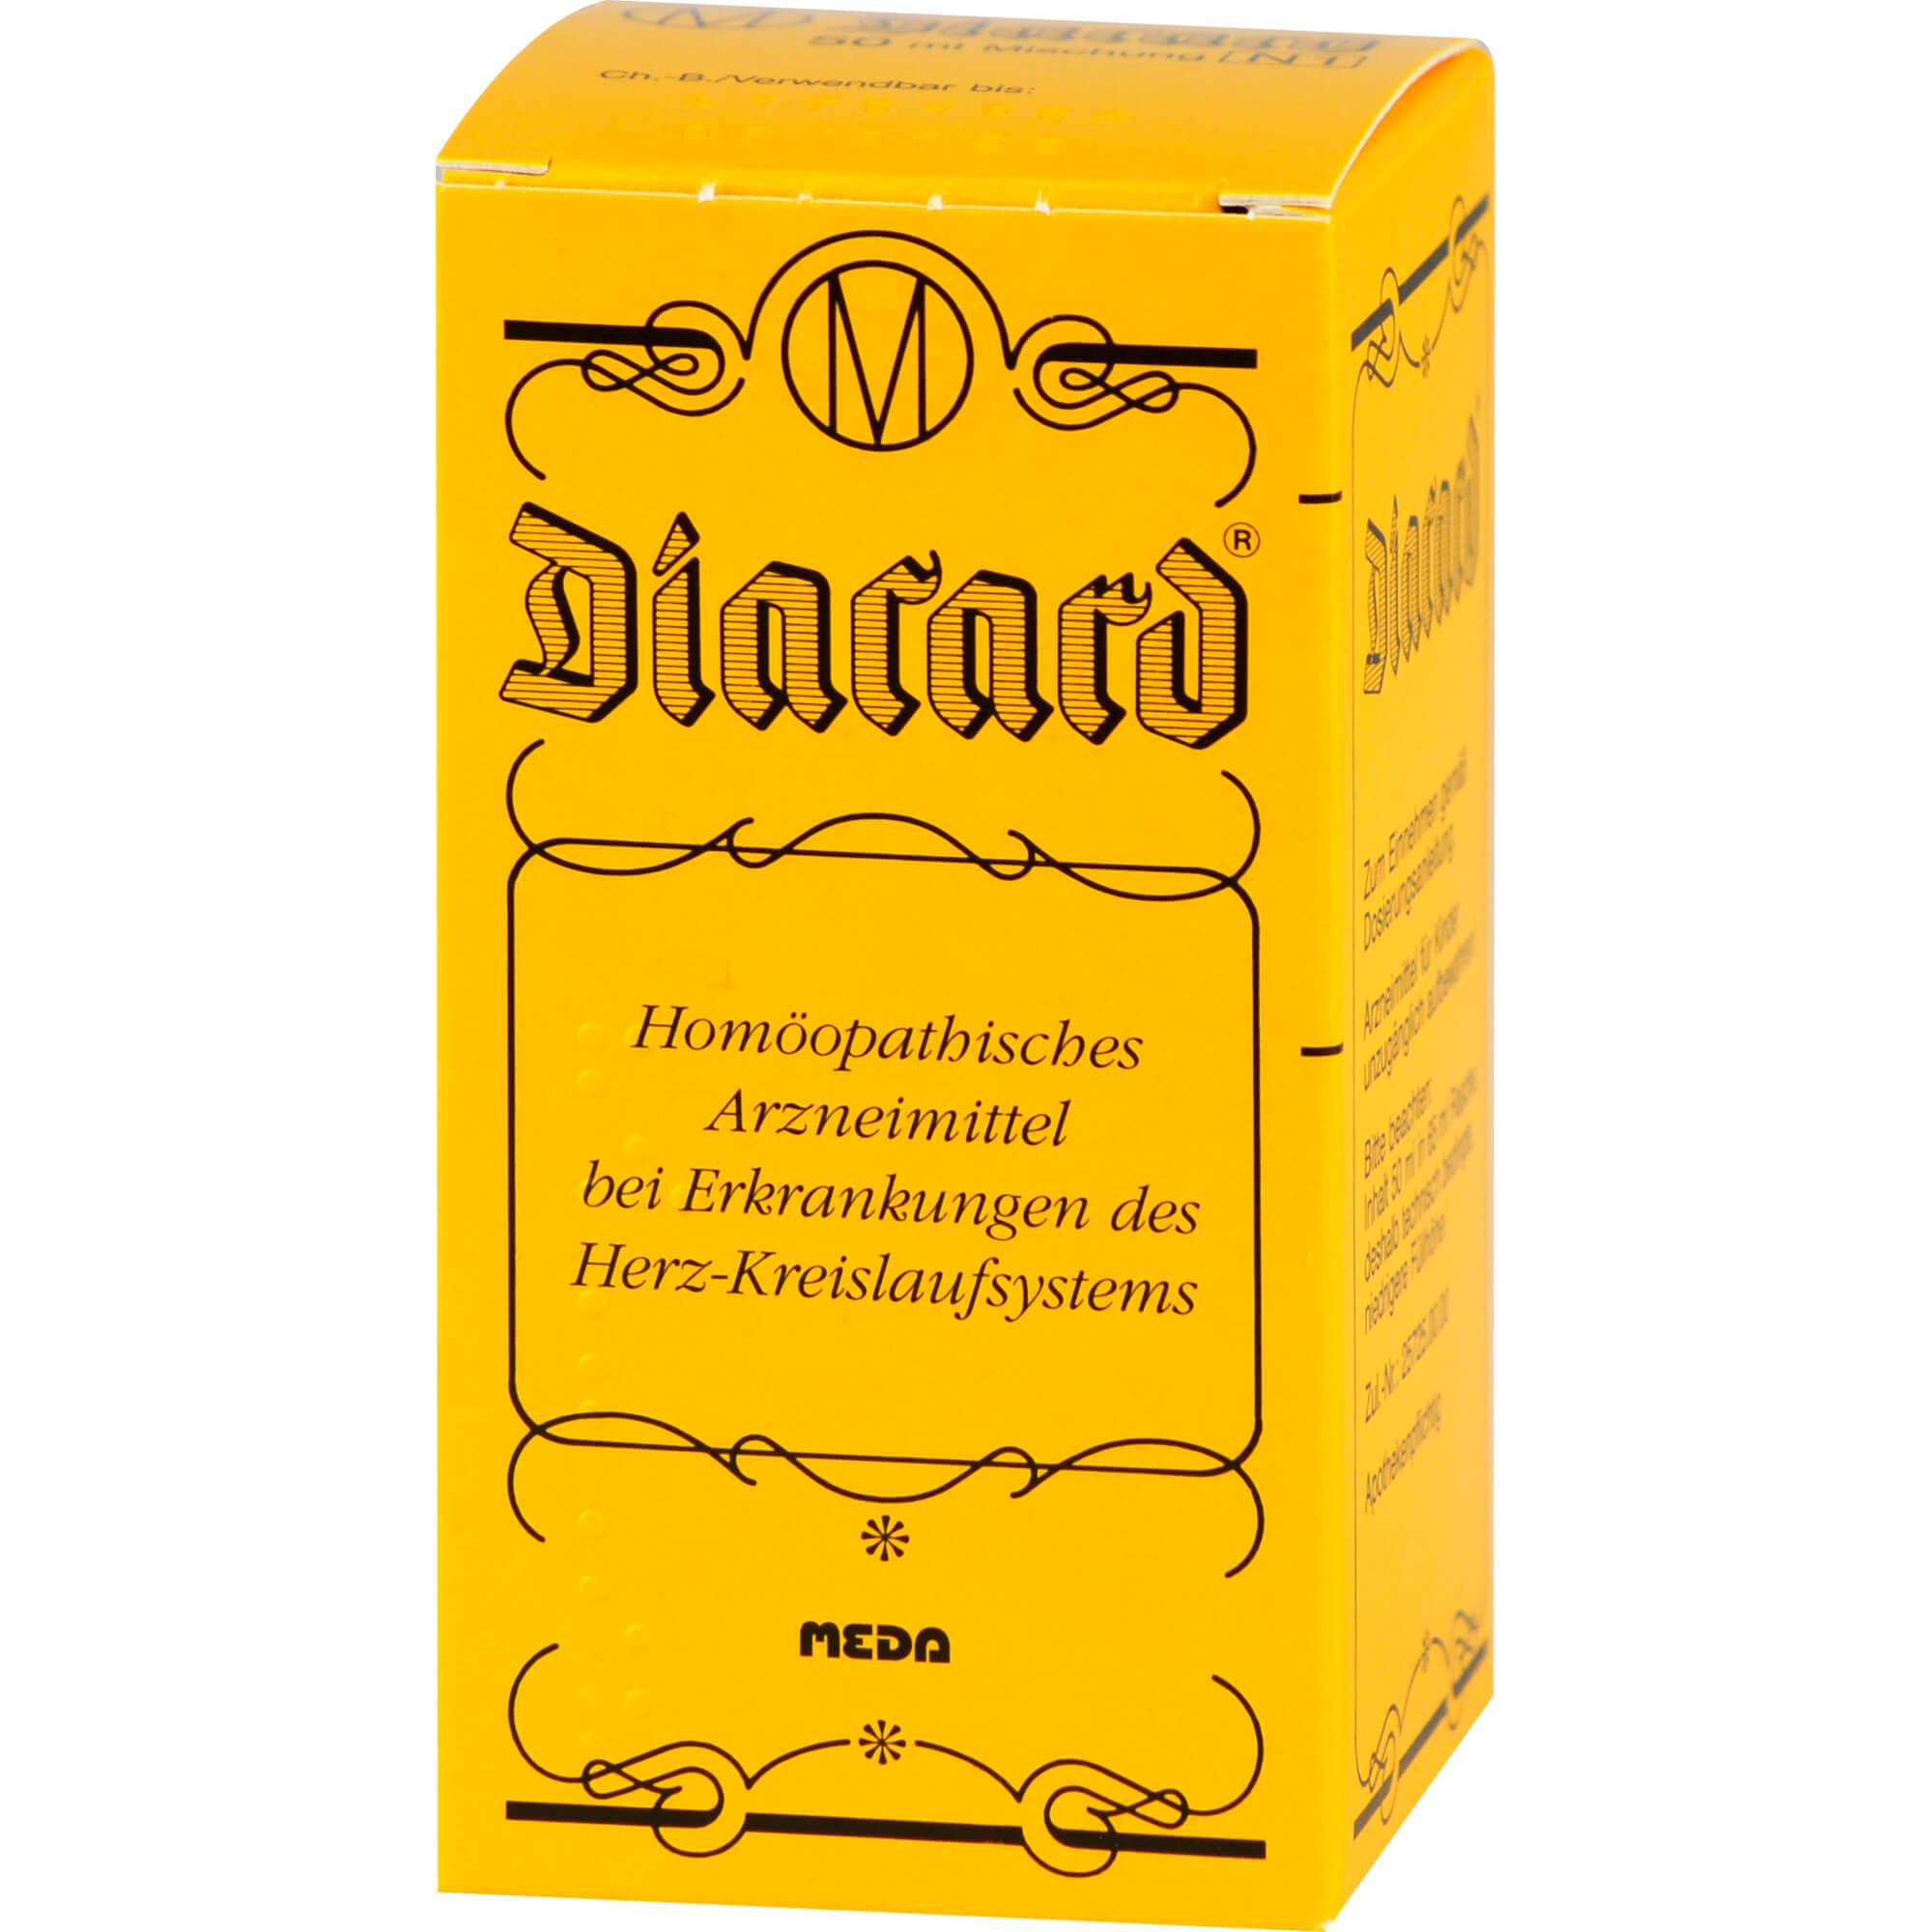 DIACARD Liquidum